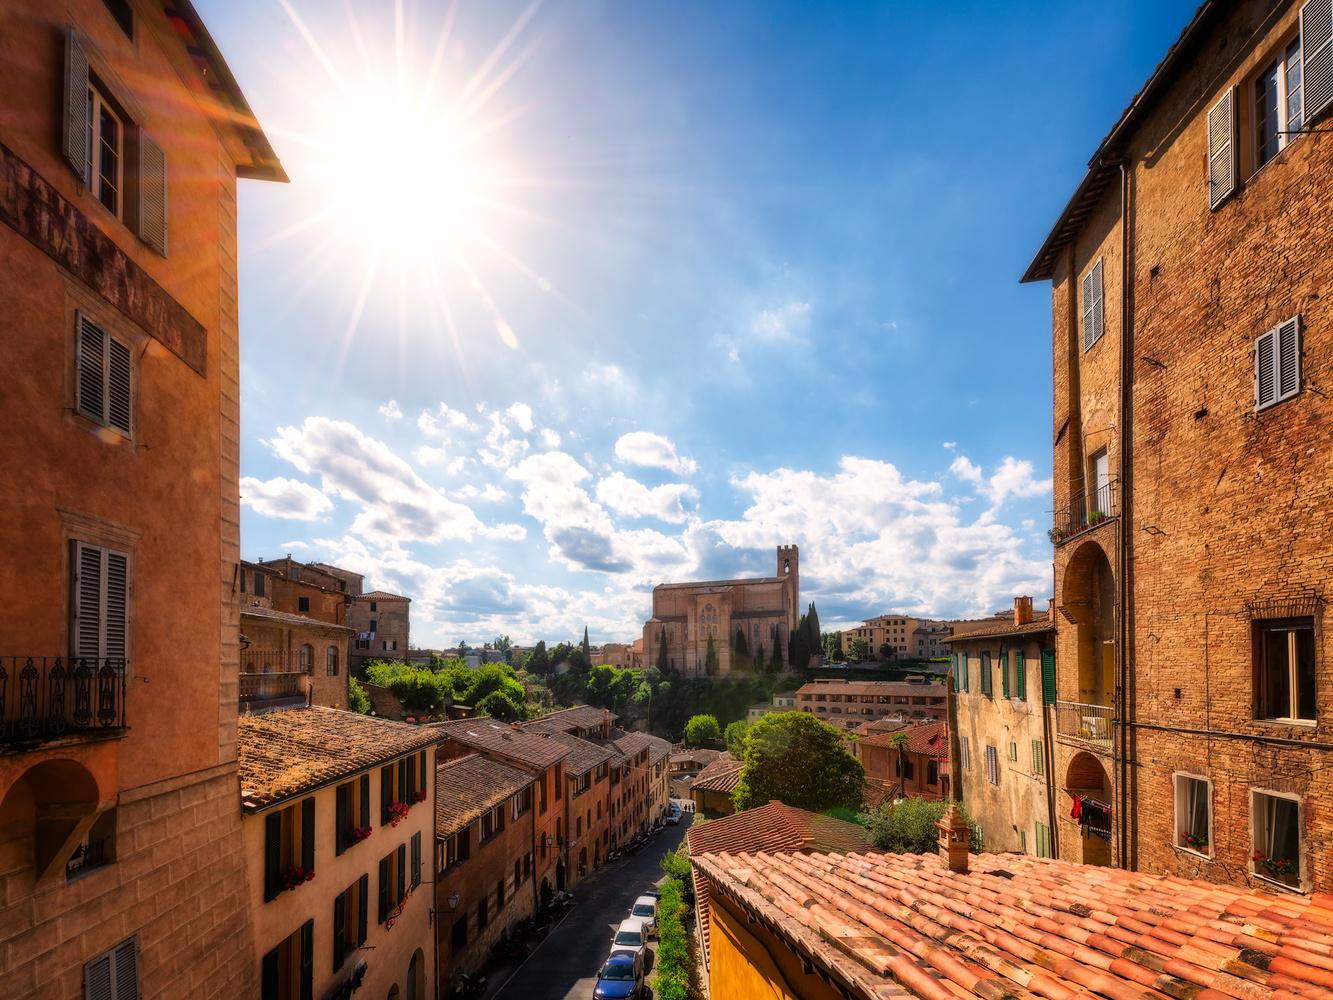 Basilica di San Domenico | Siena, Italy by Nico Trinkhaus